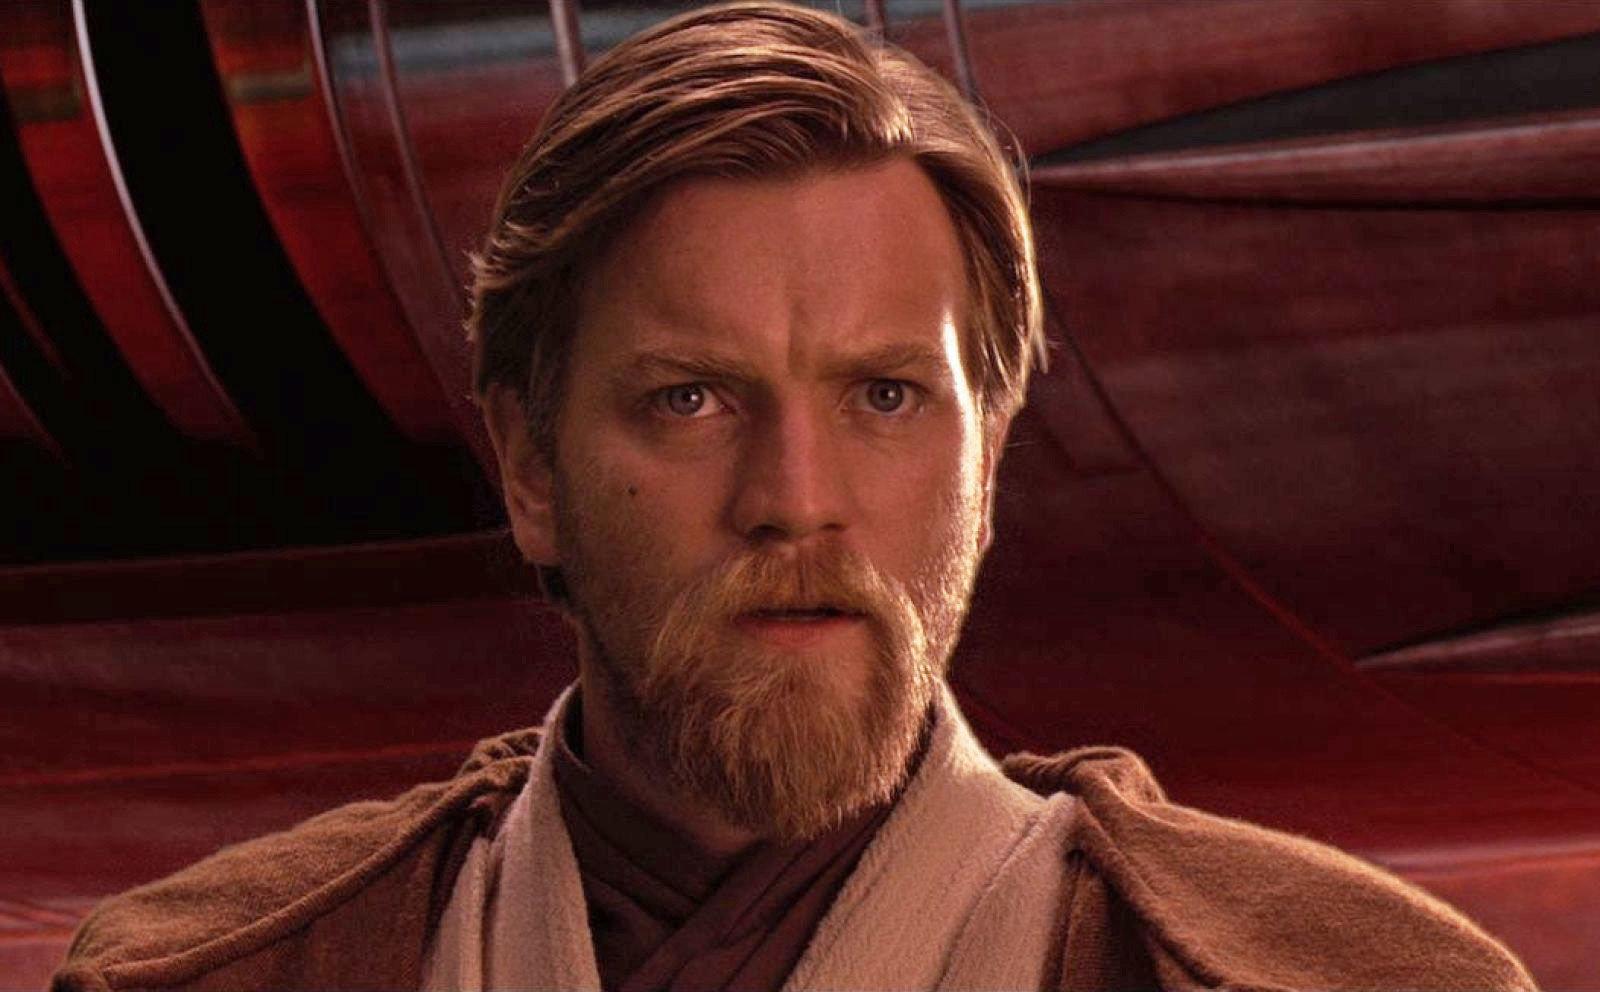 Obi Wan Ewan Mcgregor Disney Series Shooting Next Year All Scripts Ready D23 Deadline